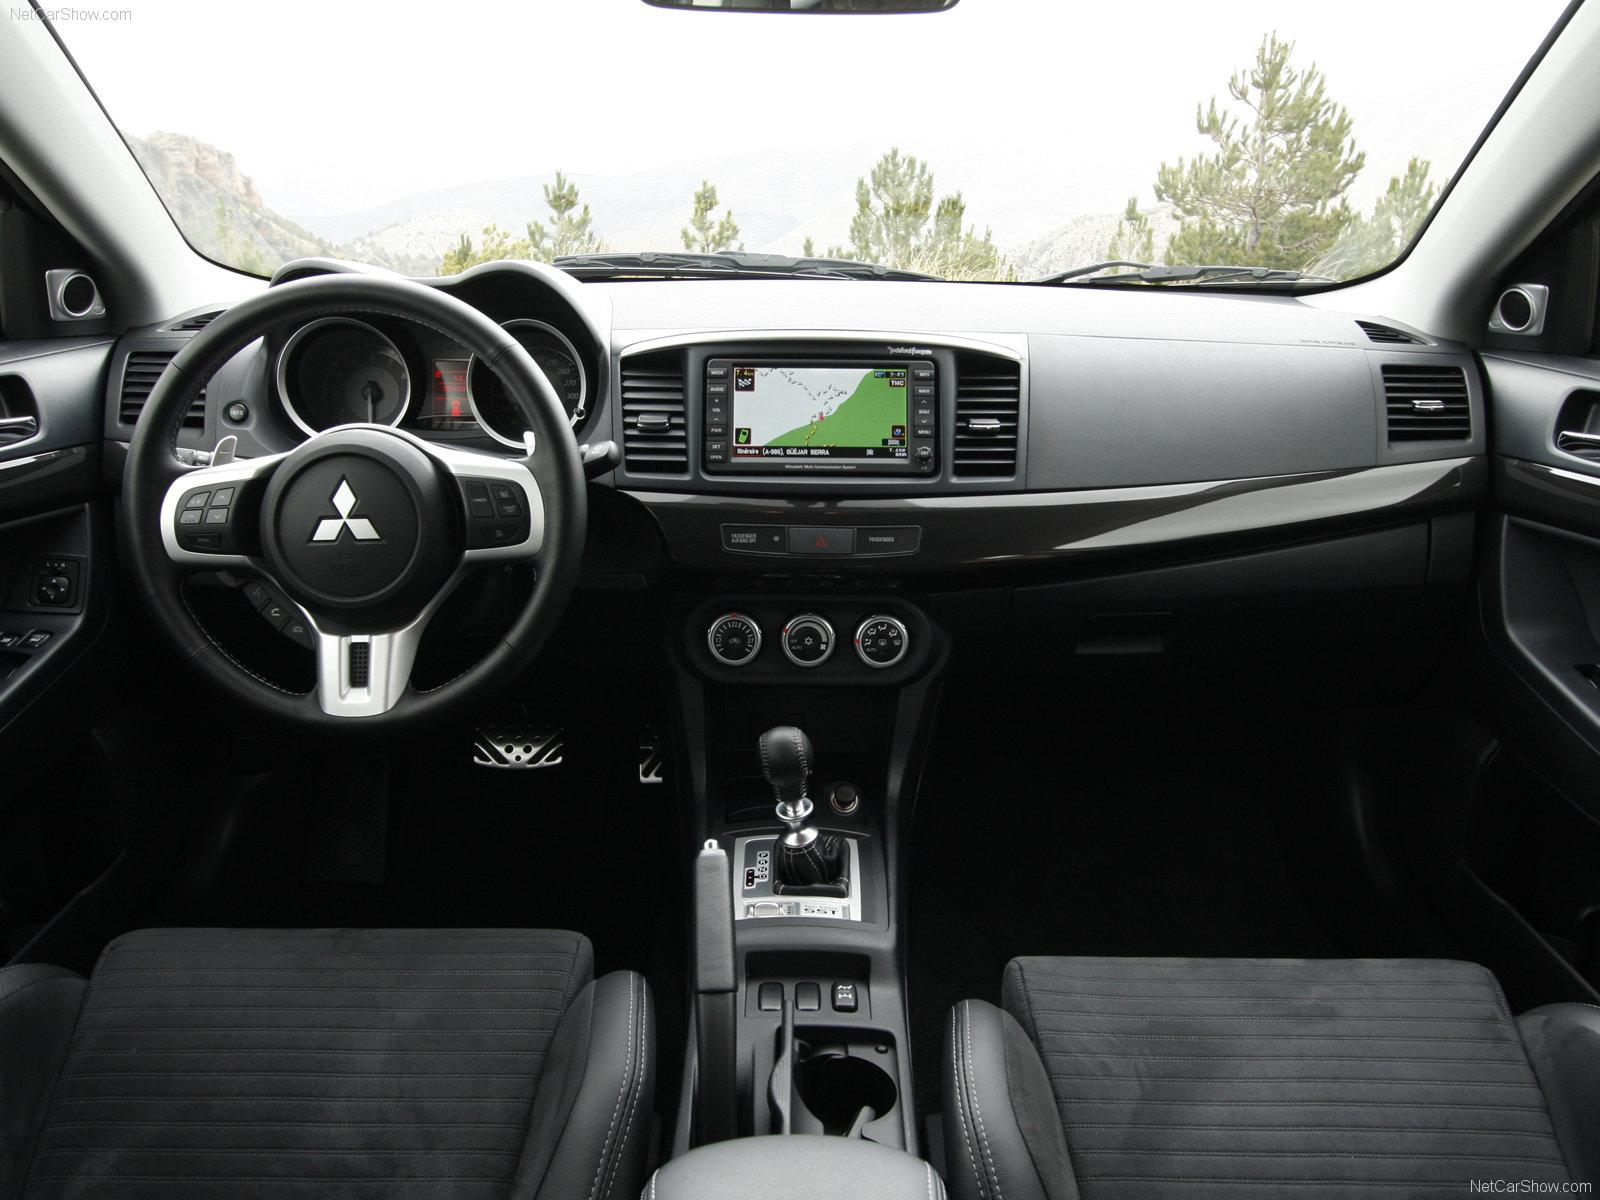 Mitsubishi Lancer Evolution X 2007 - 2016 Sedan #5